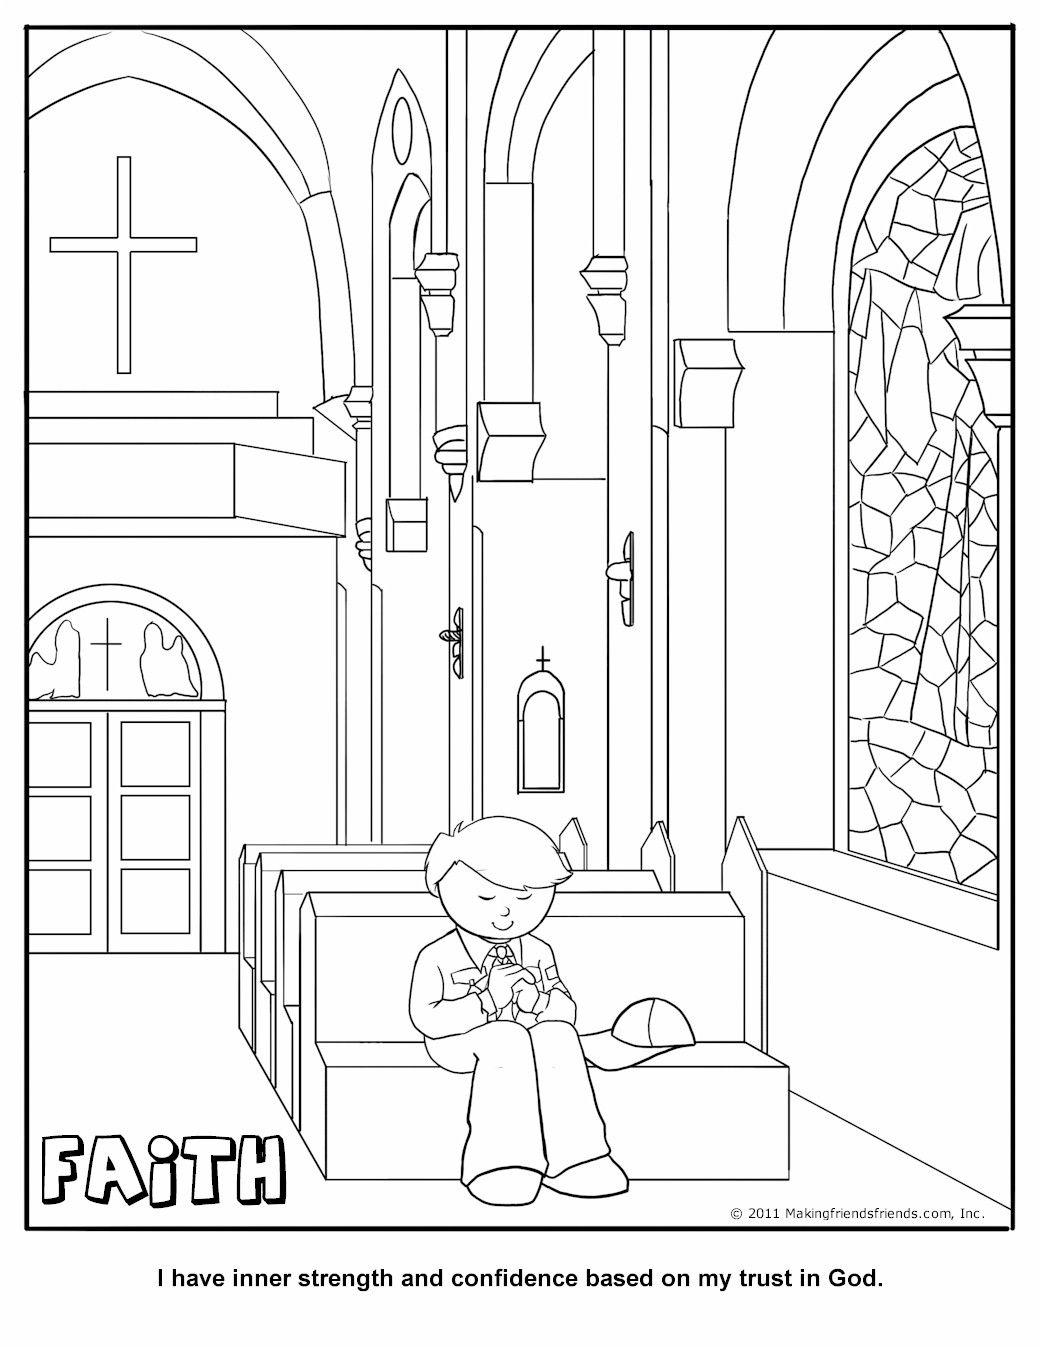 Faith Coloring Page Wolf Cub Achievement 11a